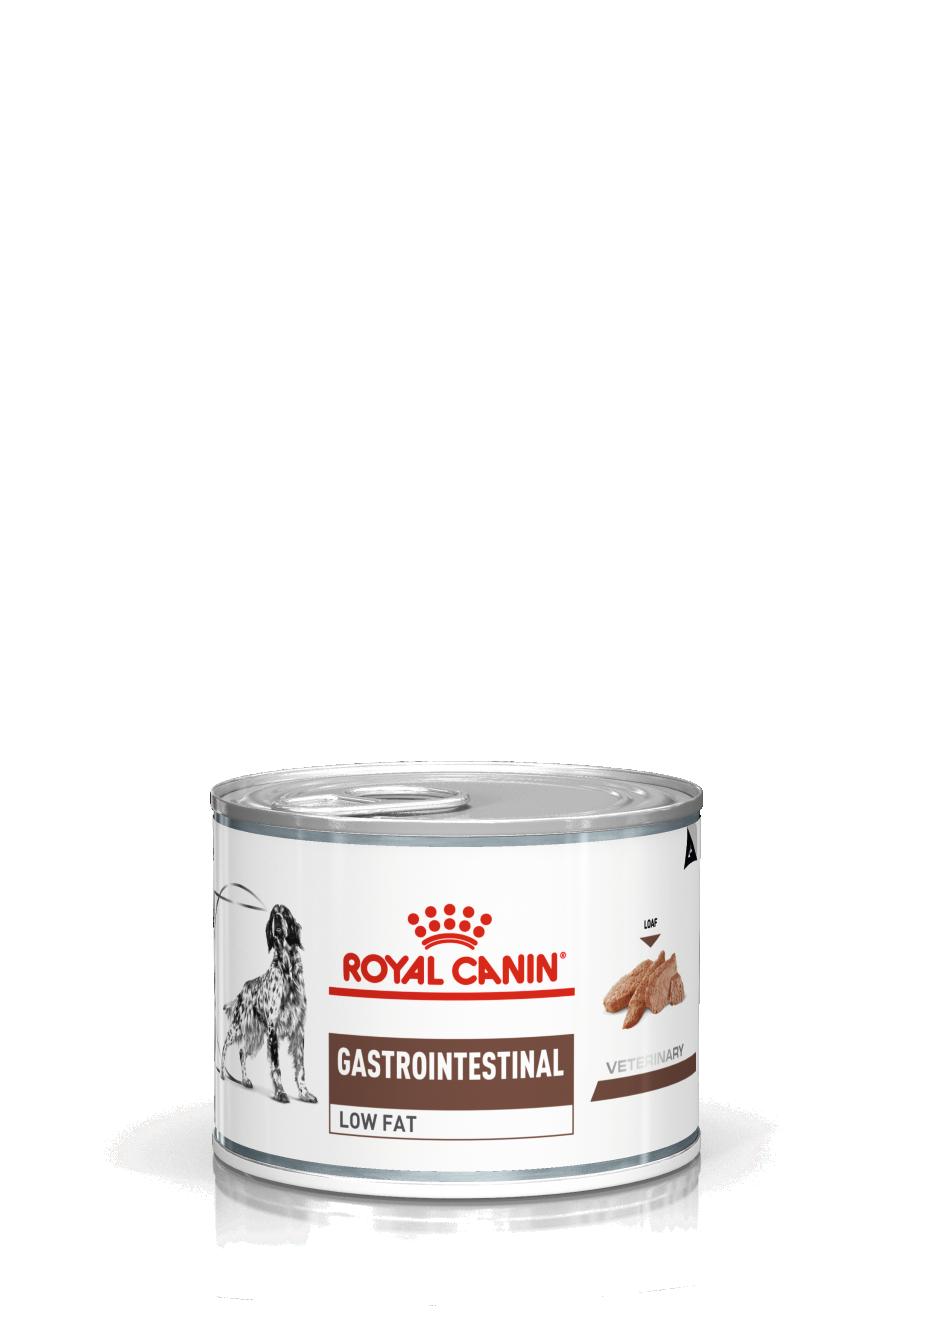 Royal Canin Gastrointestinal Low Fat Mousse 12 Dosen je 200g